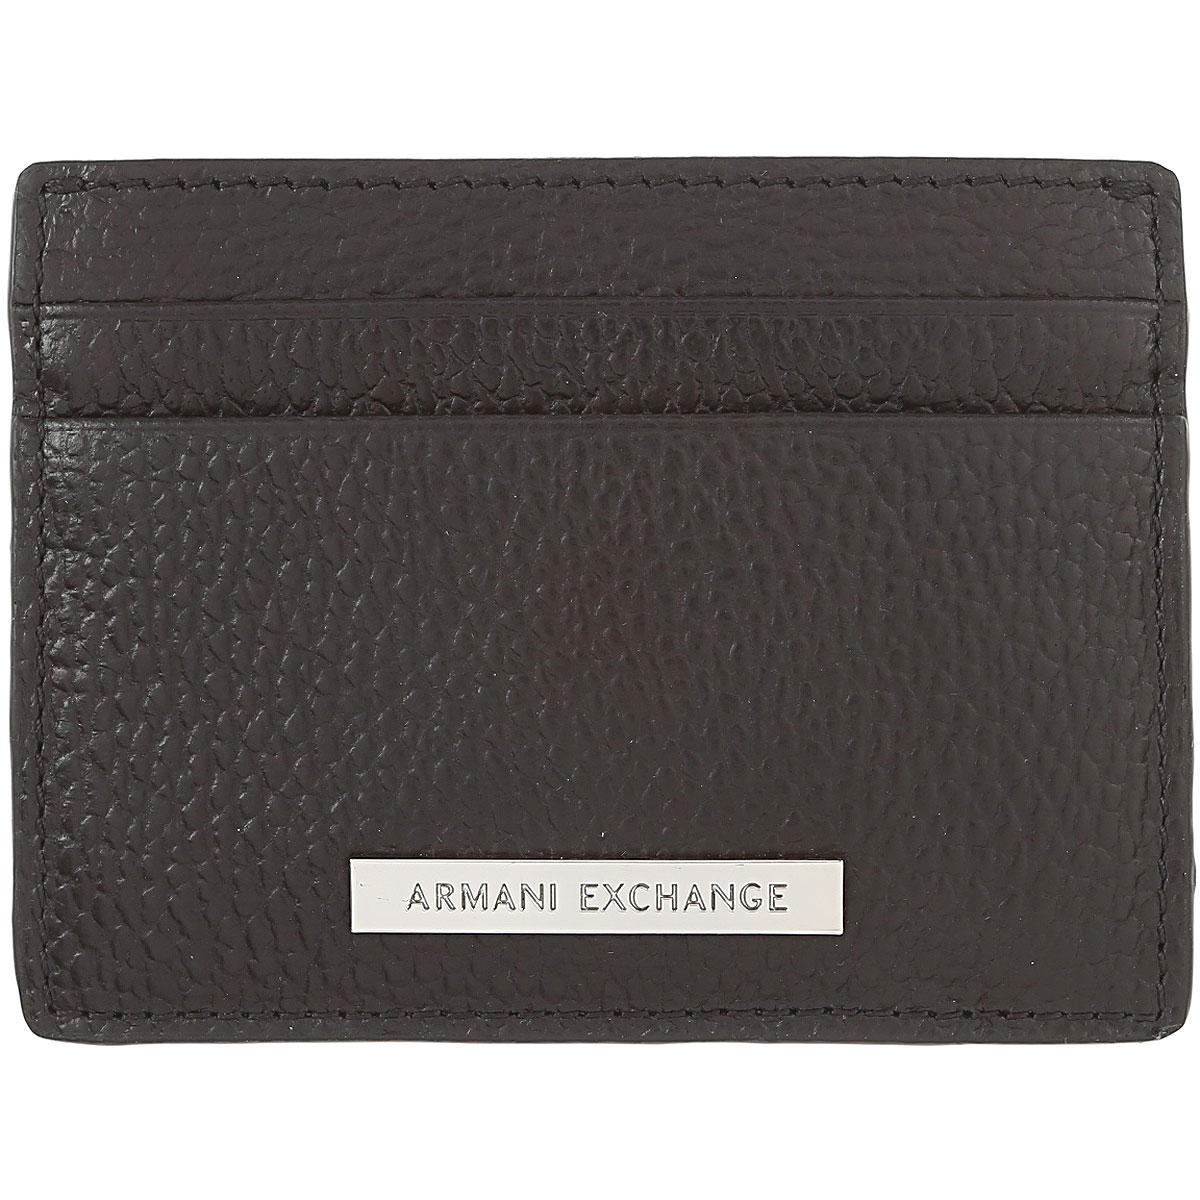 Image of Armani Jeans Card Holder for Men, Black, Leather, 2017